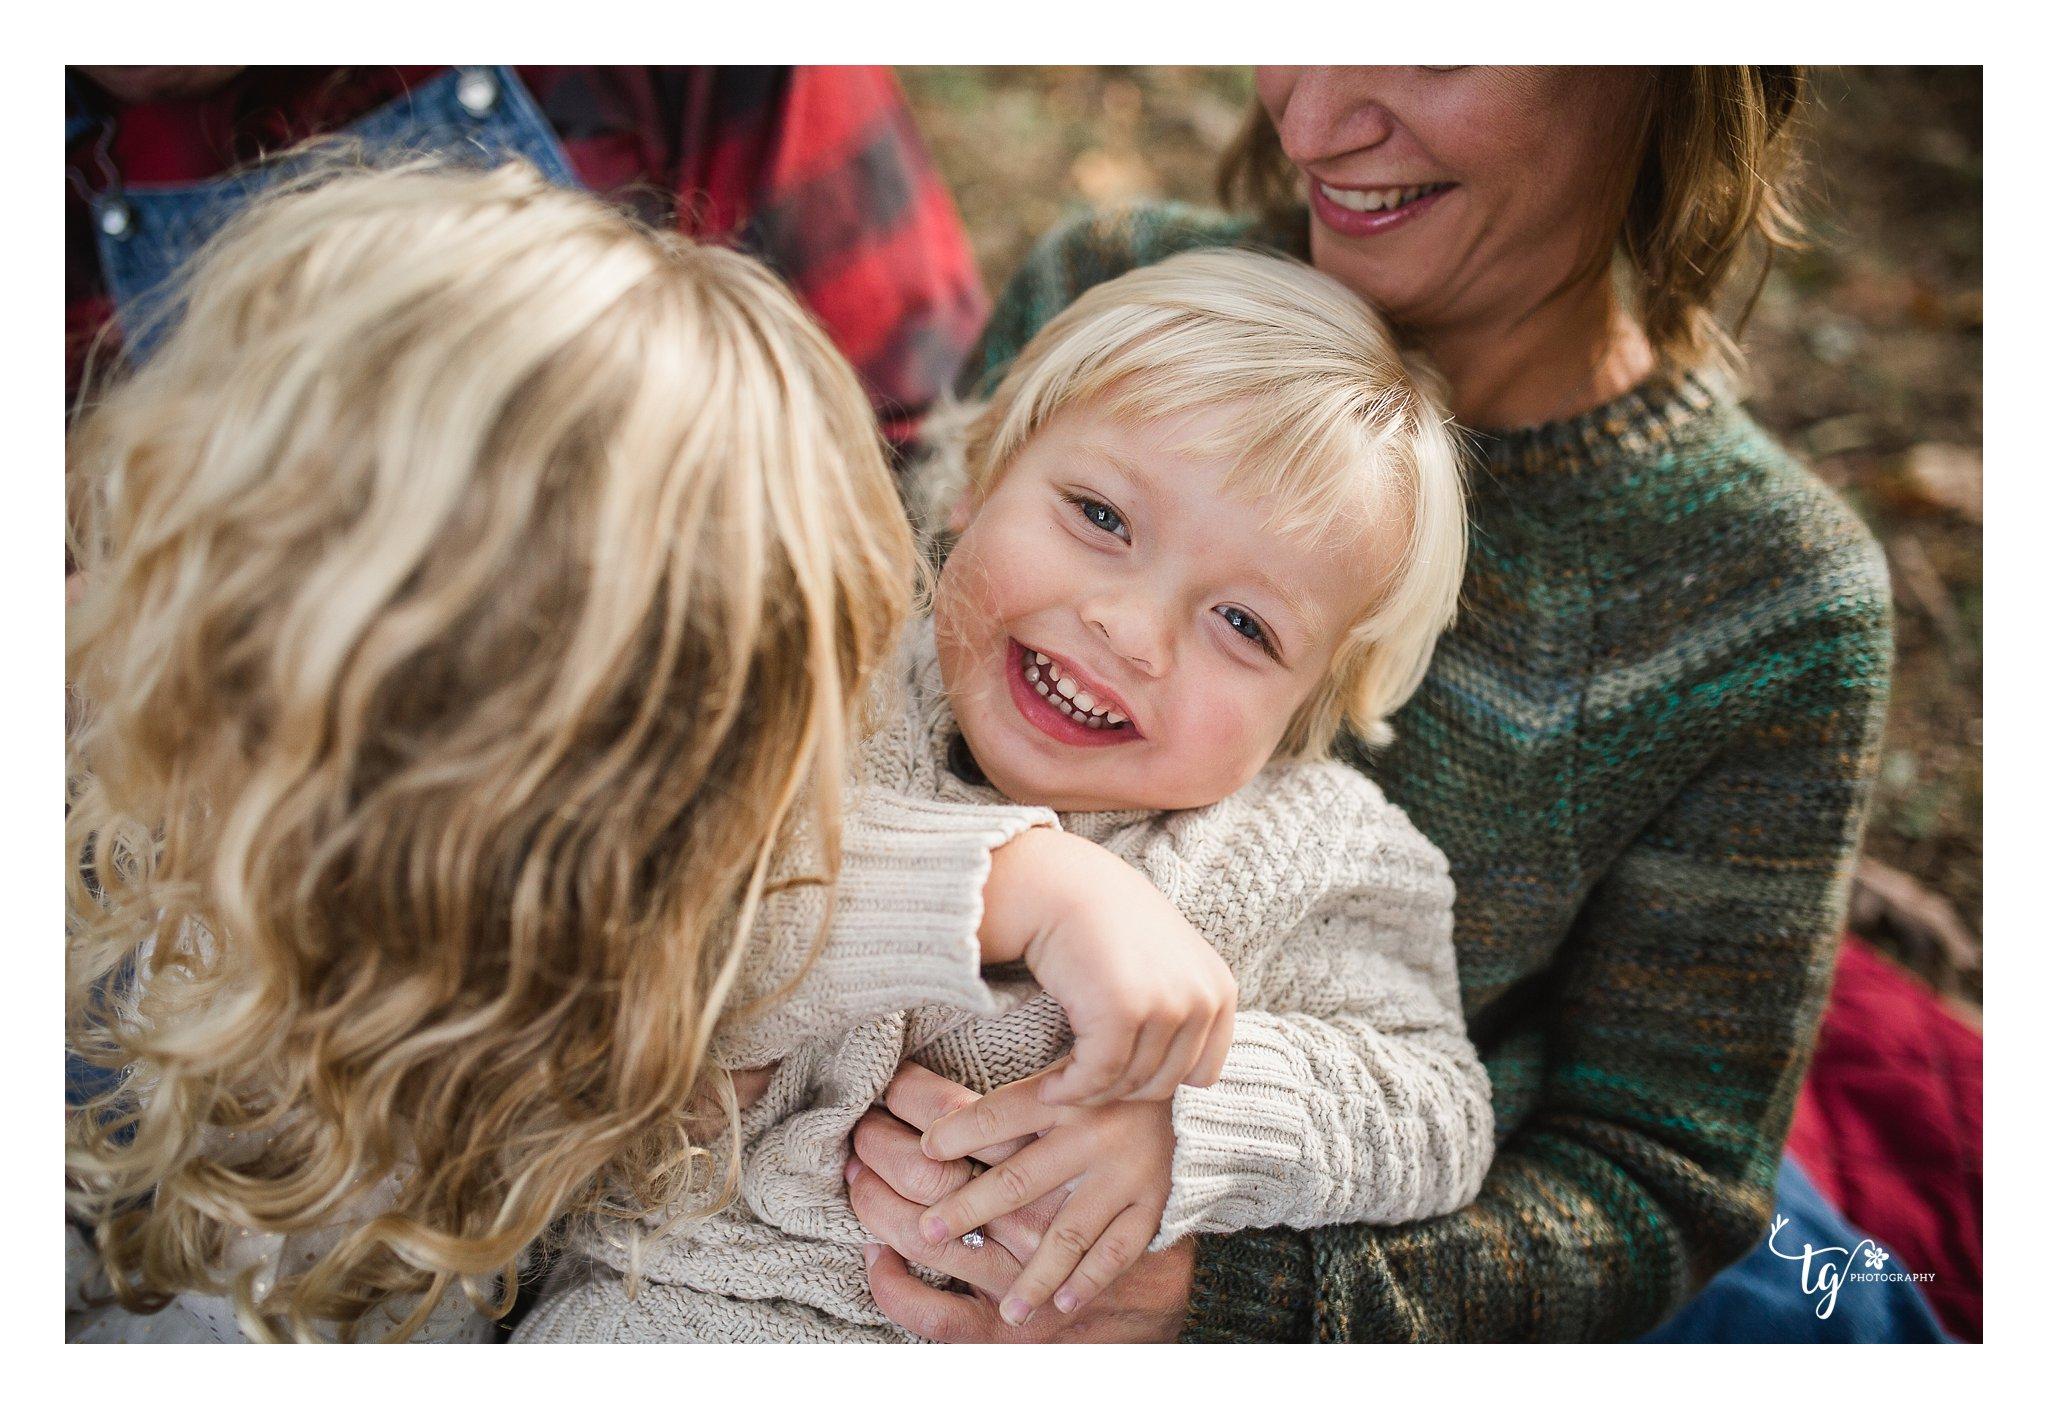 fun and interesting family photos